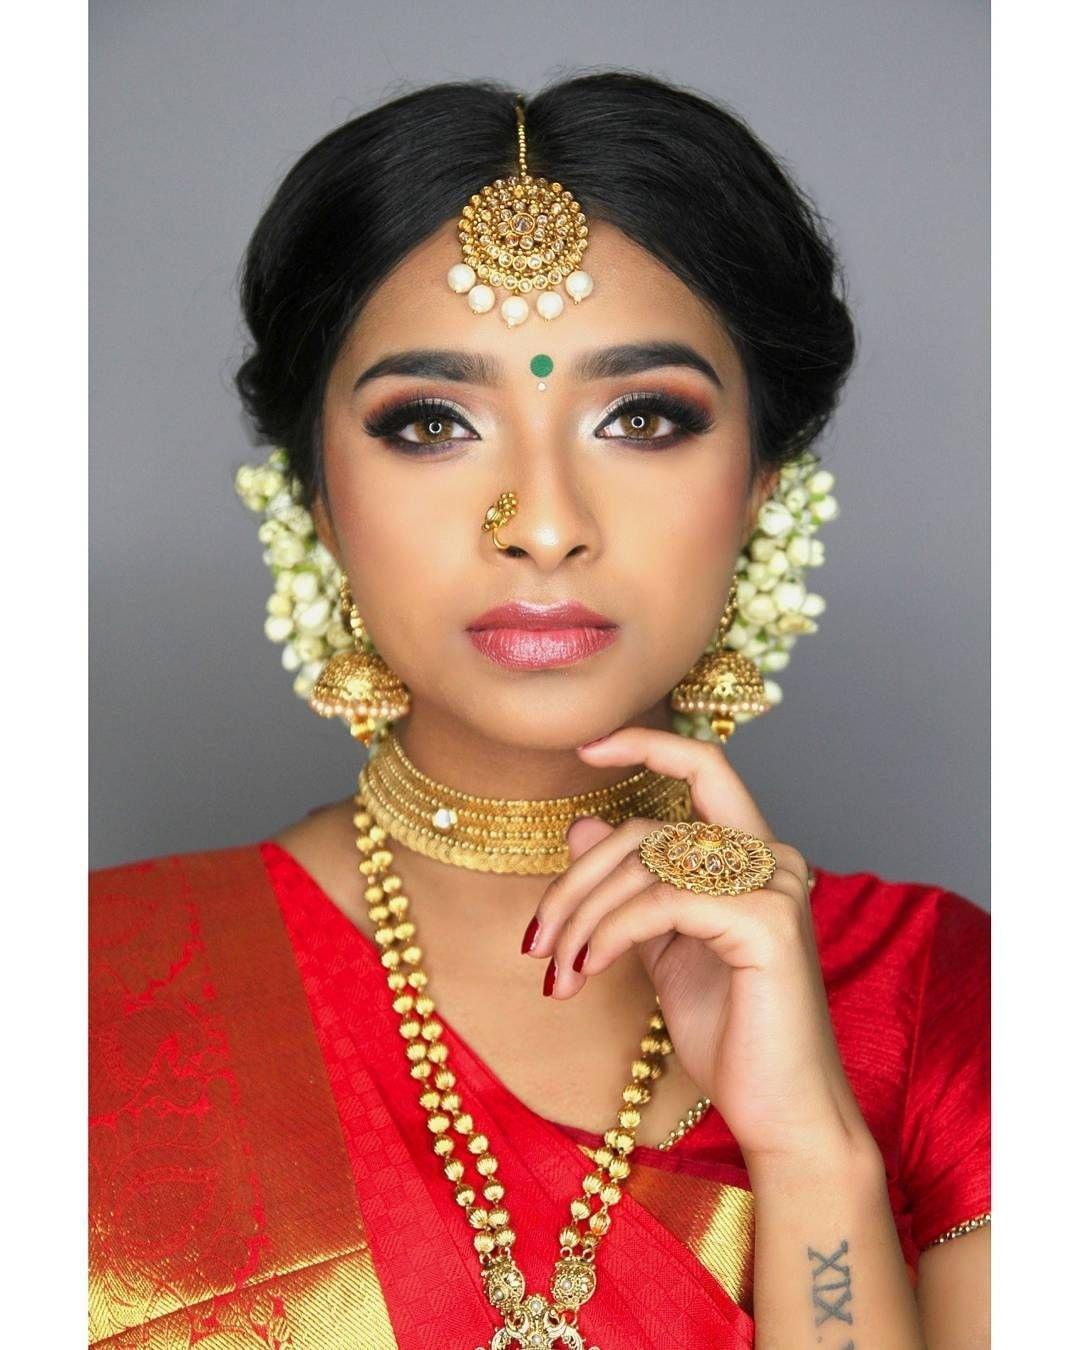 Asian Bridal Look | 2018 - My Beautiful Bride @shalw_04 - Hair, Make regarding Asian Bridal Hairstyles 2018